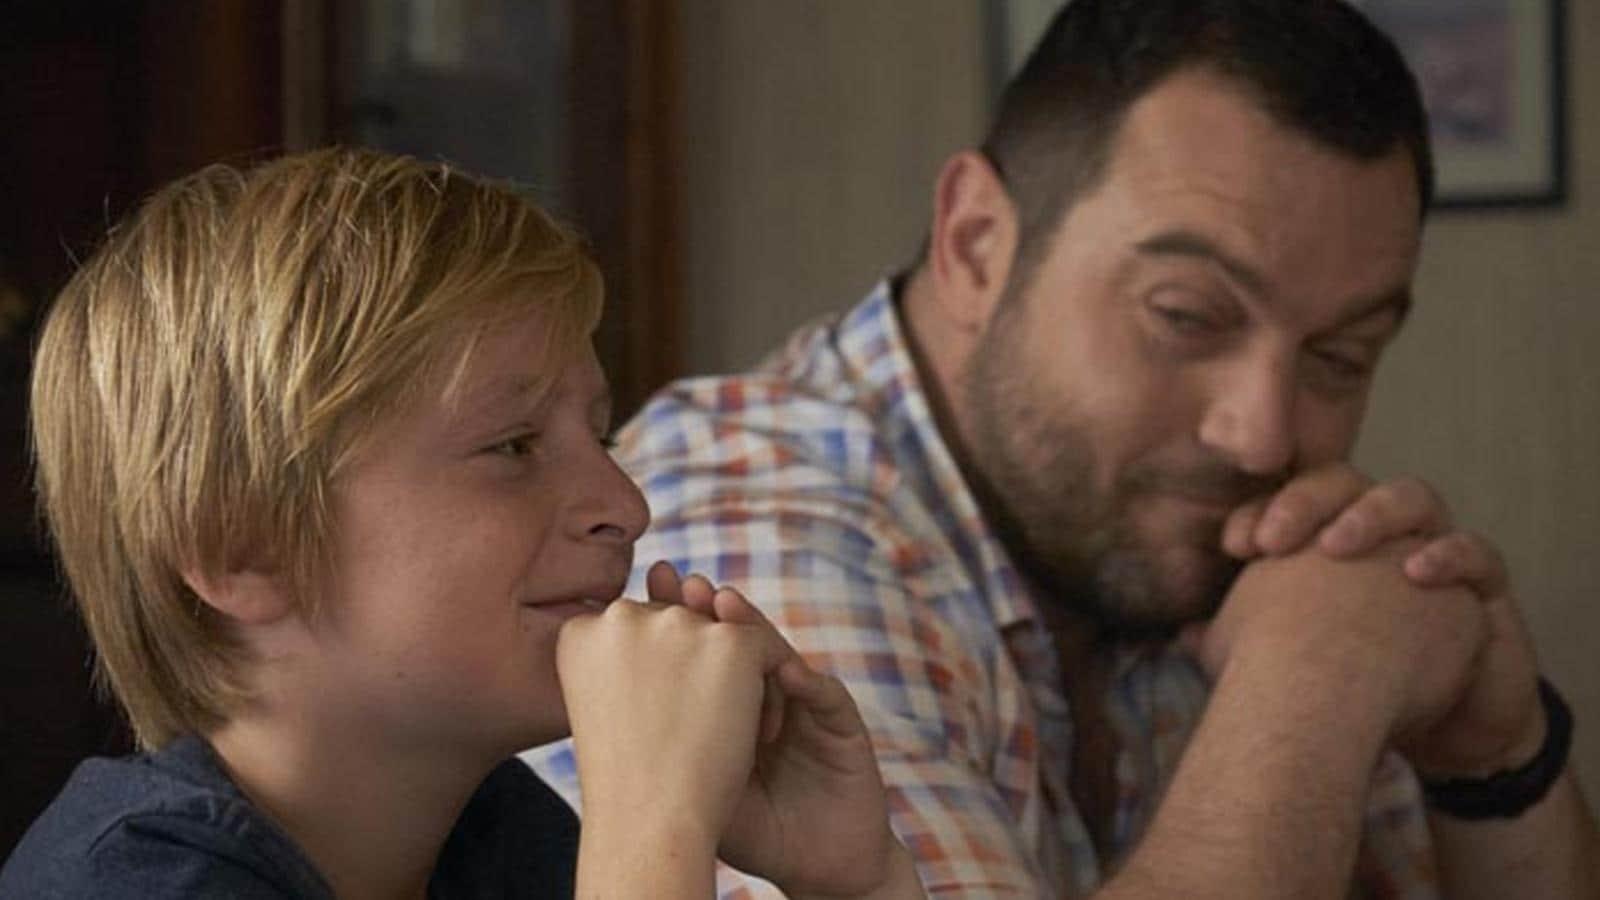 L'affido - Una storia di violenza: trama, cast e anticipazioni film in prima tv